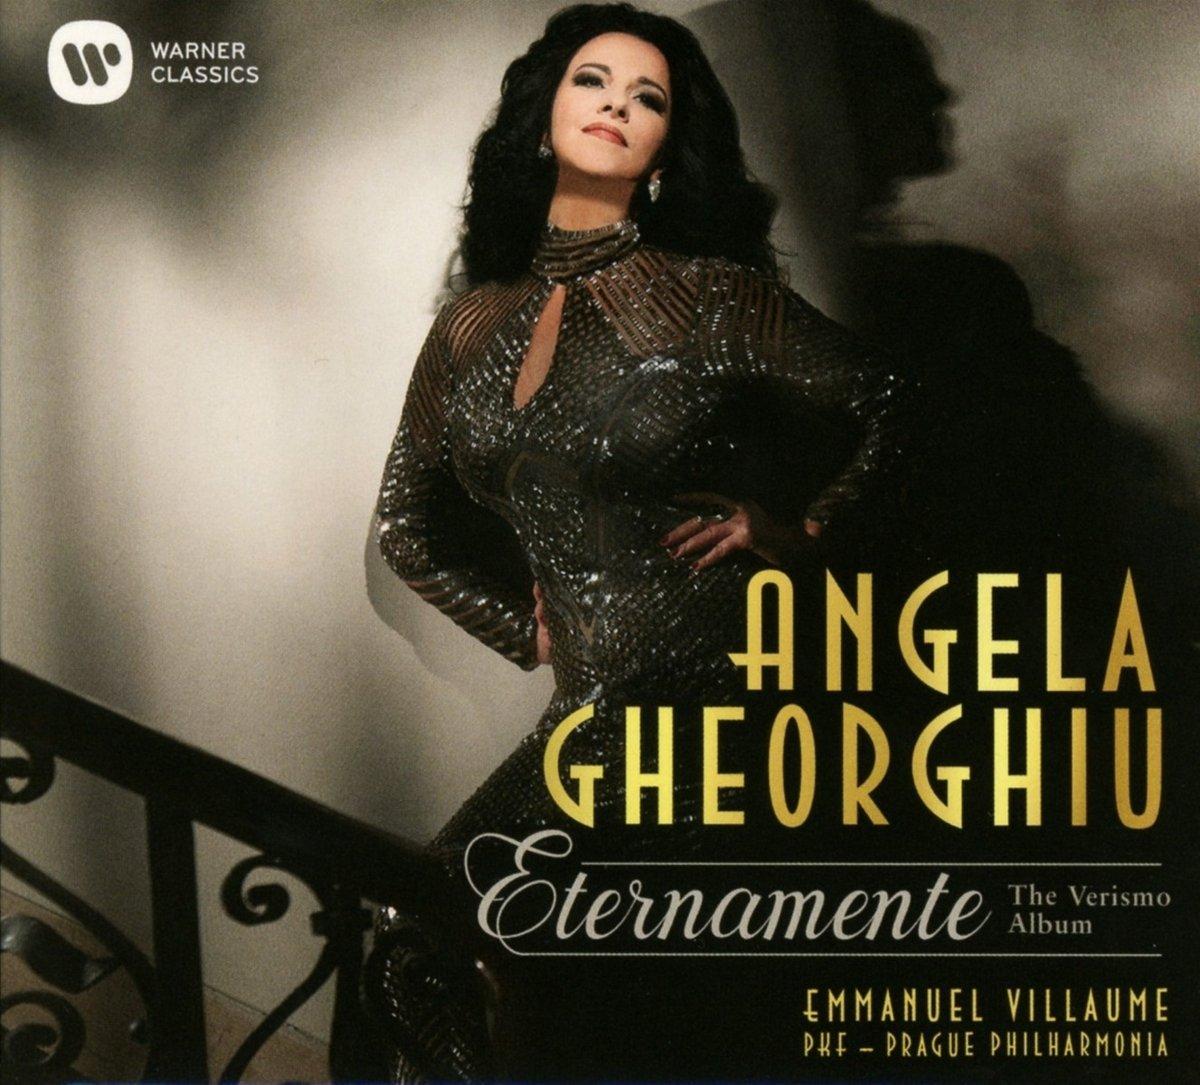 IN REVIEW: Angela Gheorghiu - ETERNAMENTE (Warner Classics 0190295780241)